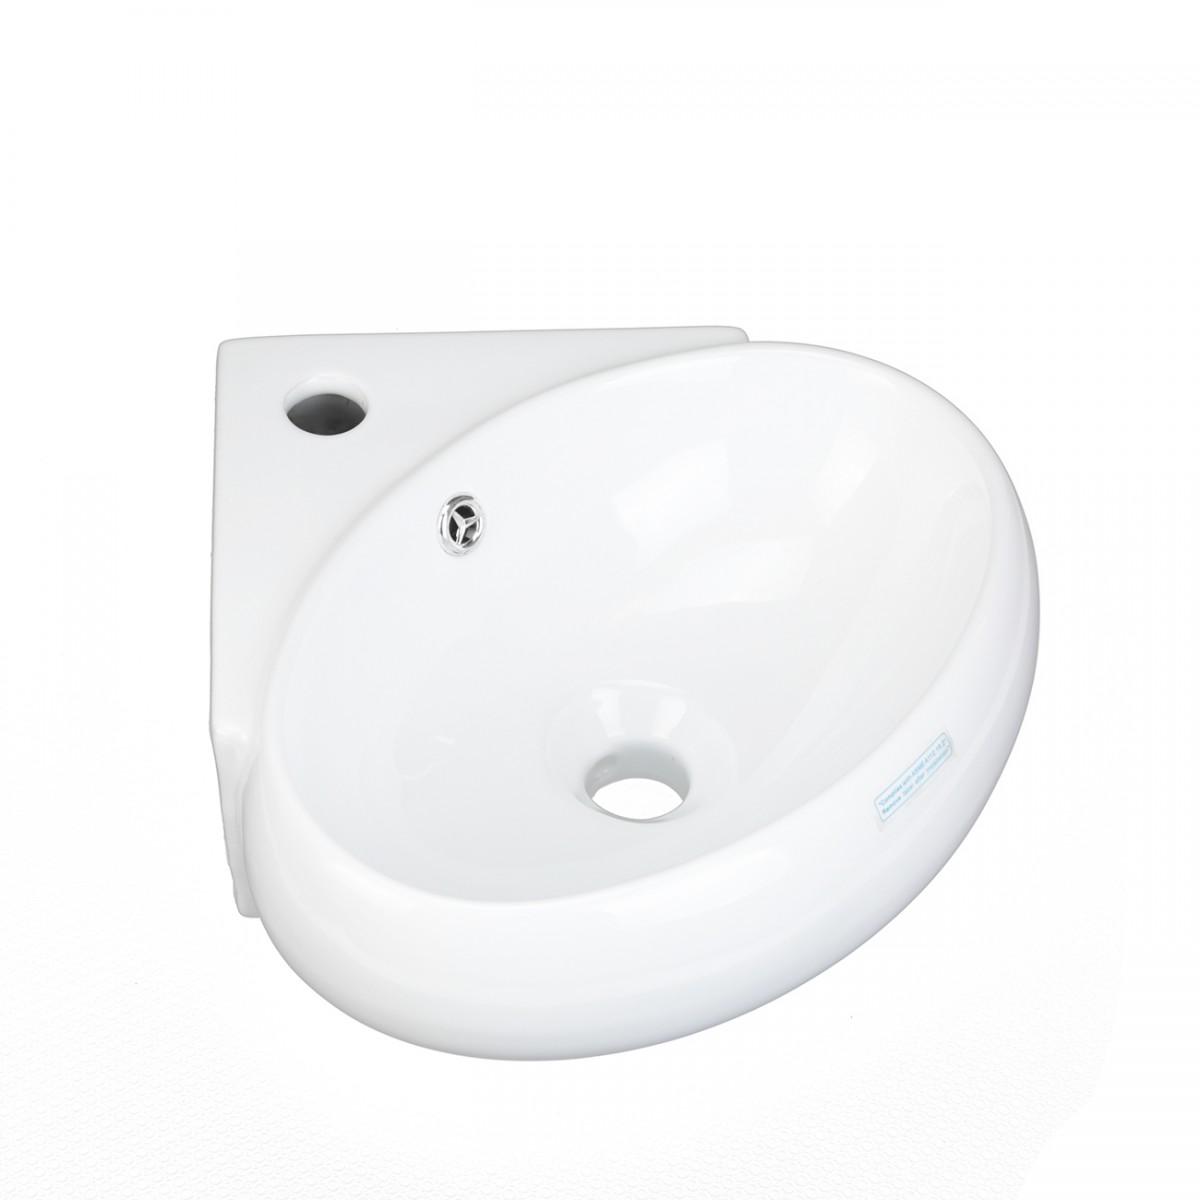 White Corner Bathroom Wall Mount Sink Vessel Counter Round Bathroom Wall Mount Sinks Modern White Bathroom Sink Vitreous China Bathroom Sinks